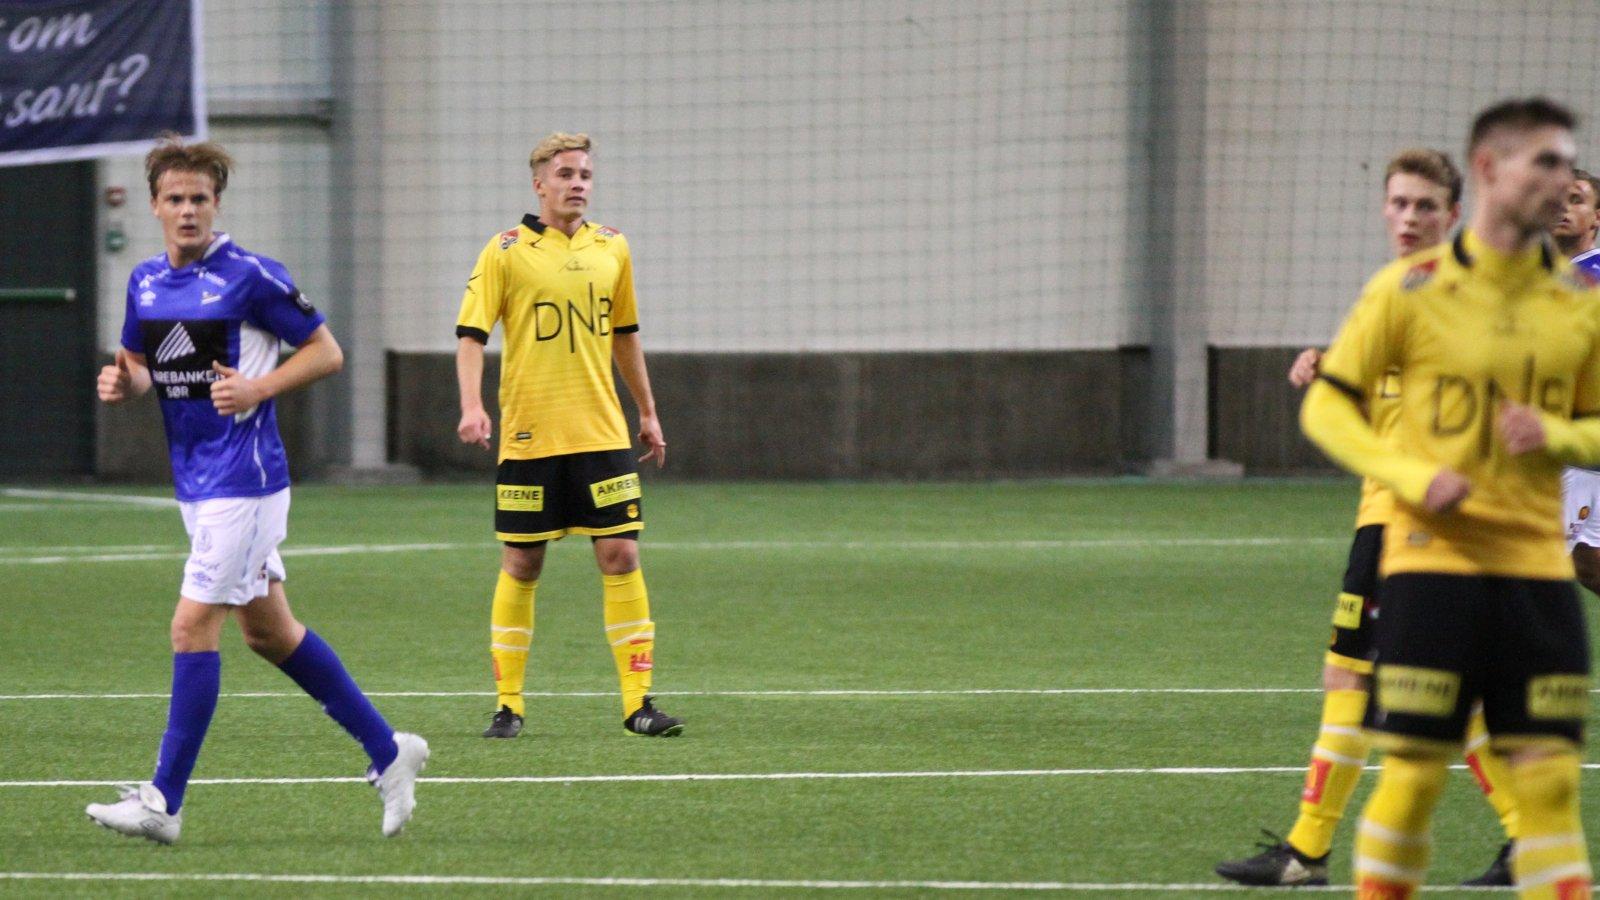 Erik Tobias Sandberg mot Start